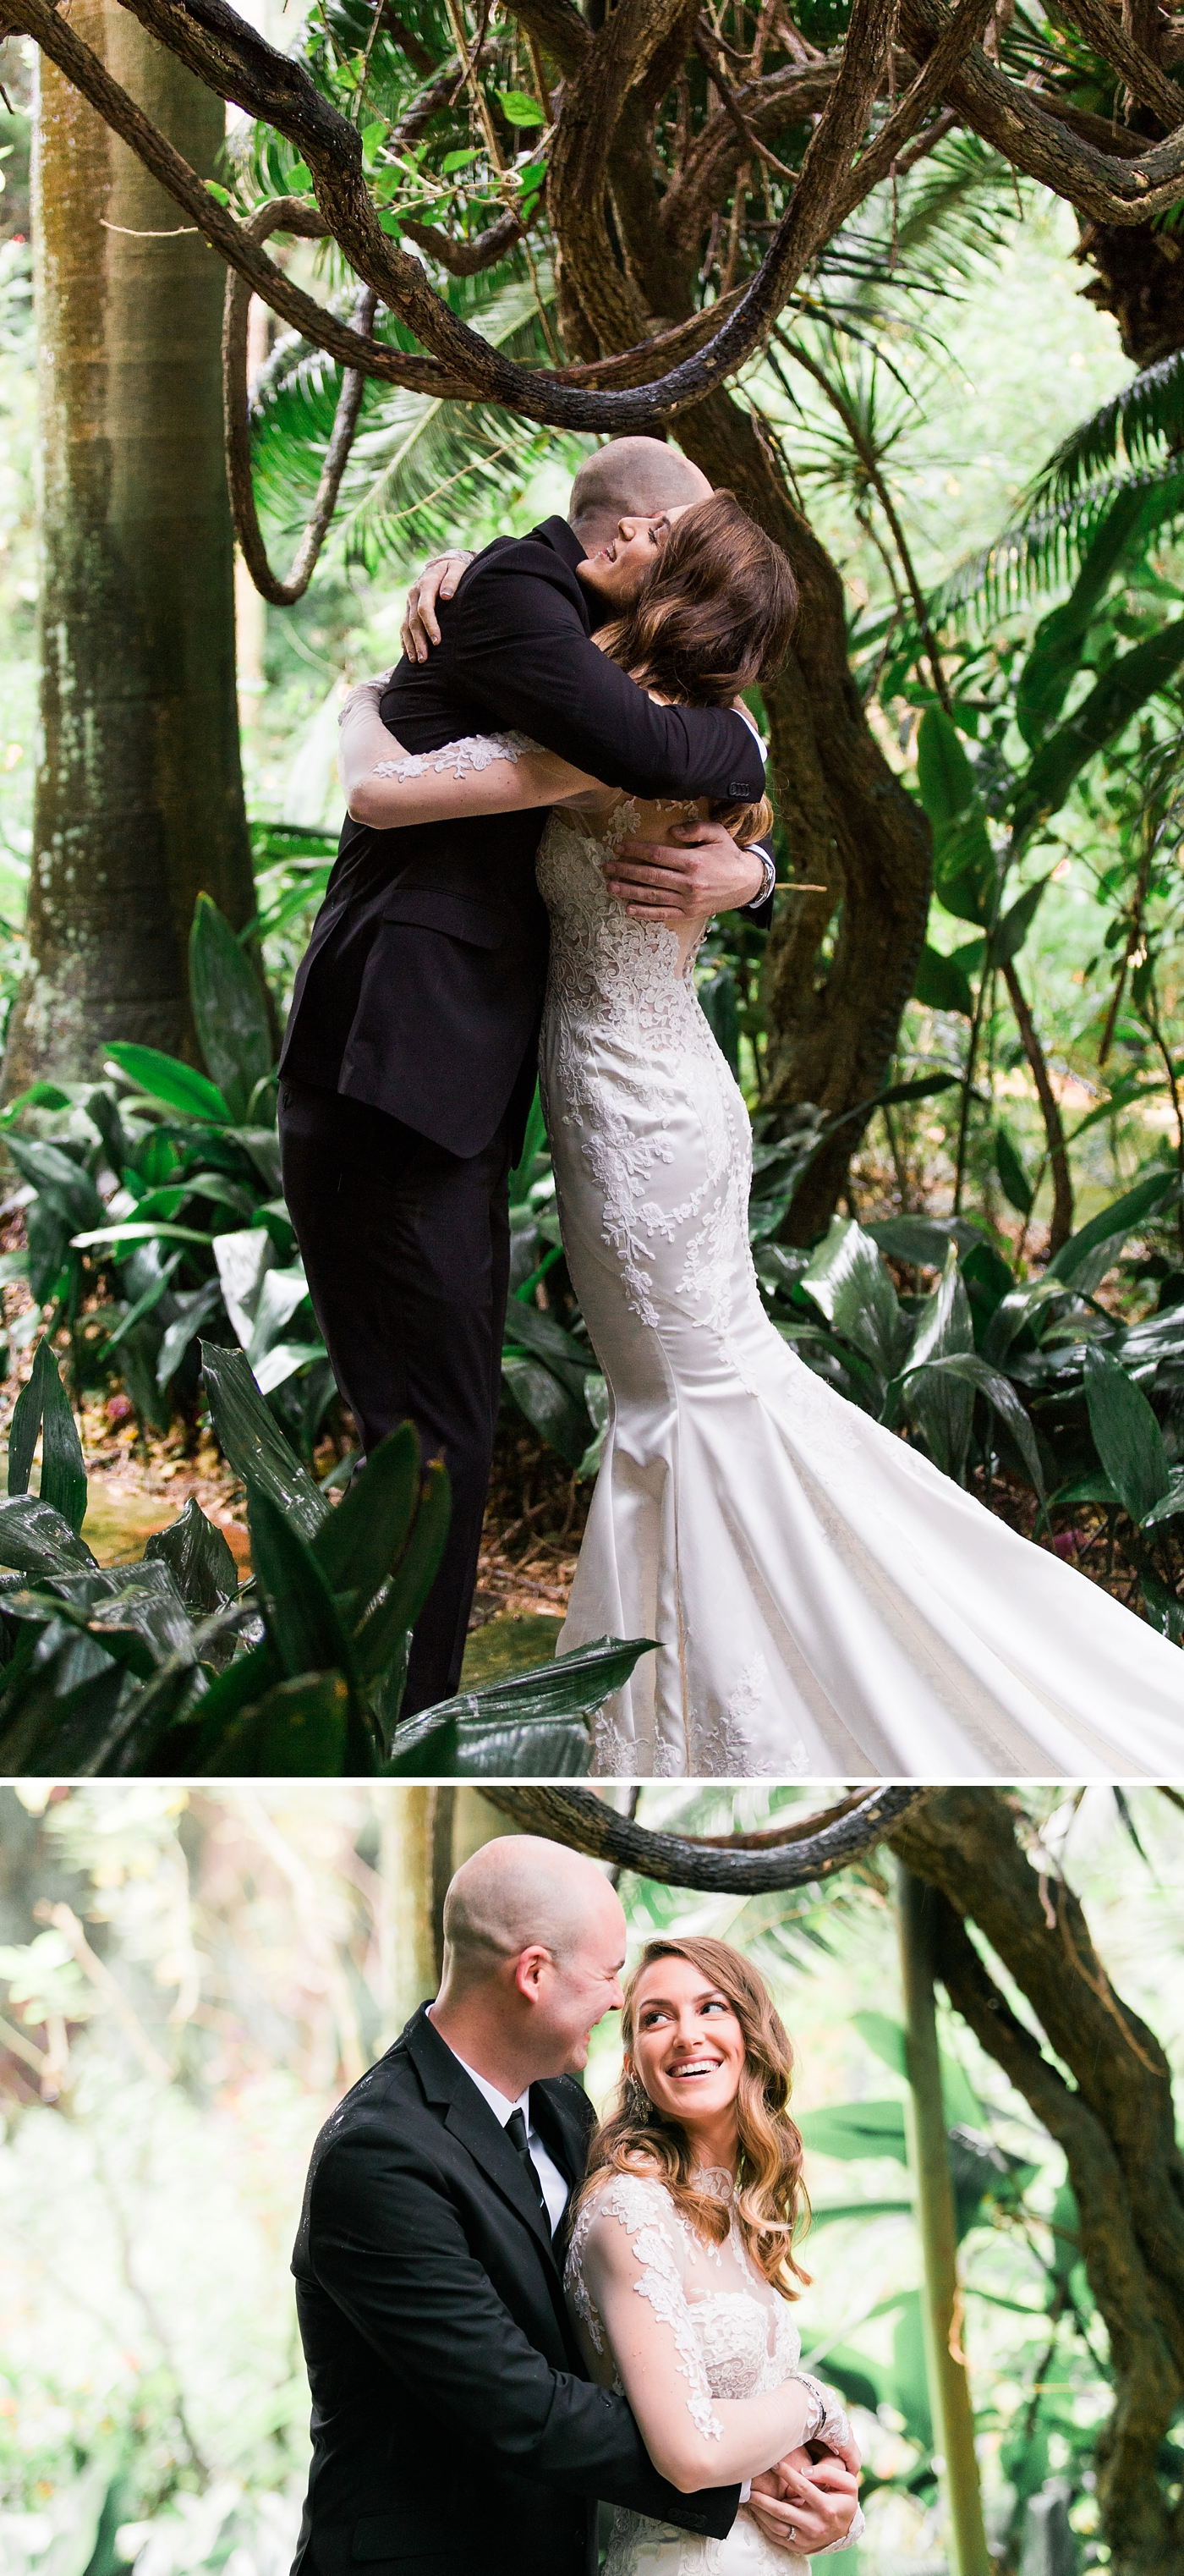 orlando-wedding-photography-justin-gilbert-tampa-sunken-gardens_0008.jpg